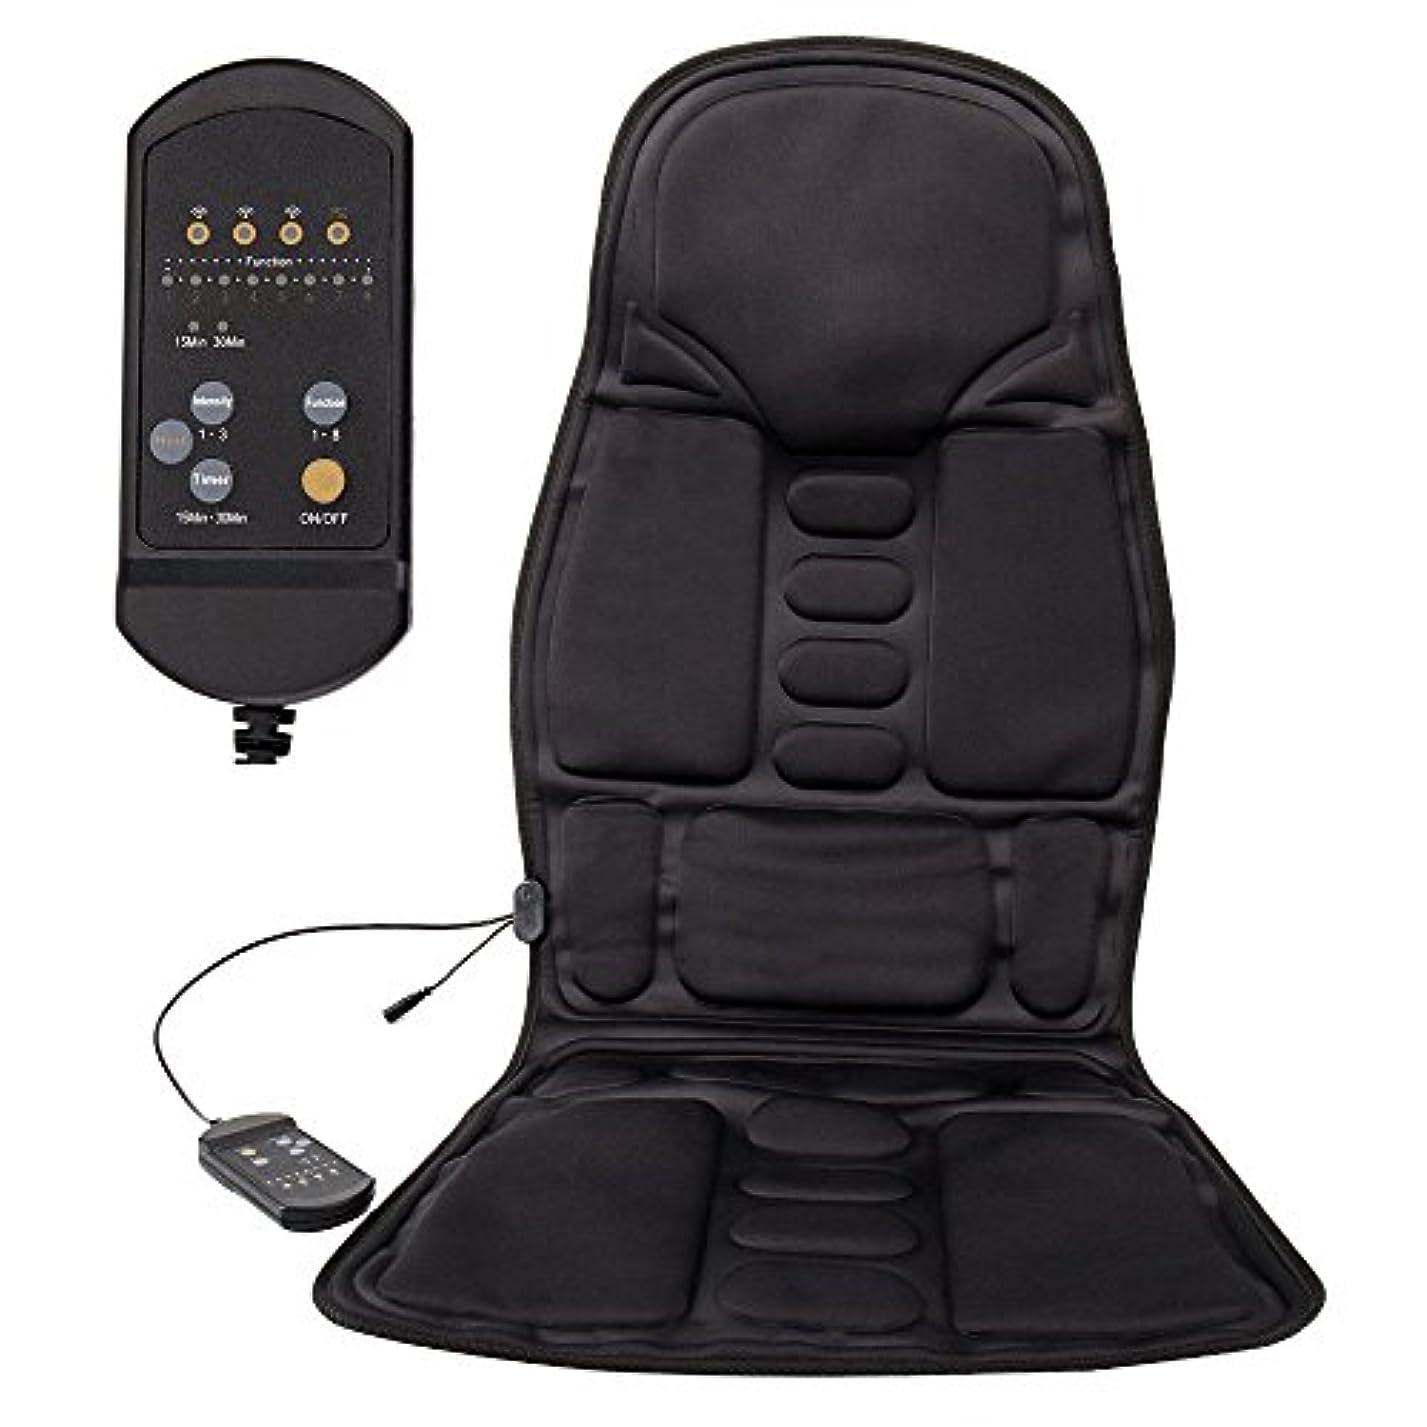 LoveStory マッサージシート シートマッサージャー カーシートカバー マッサージ器 座椅子用 高品質PUレザー製車載用ツインバードマッサージシート ヒーターマッサージ 5機能5もみ玉付き 汎用 椅子や座椅子用 持...